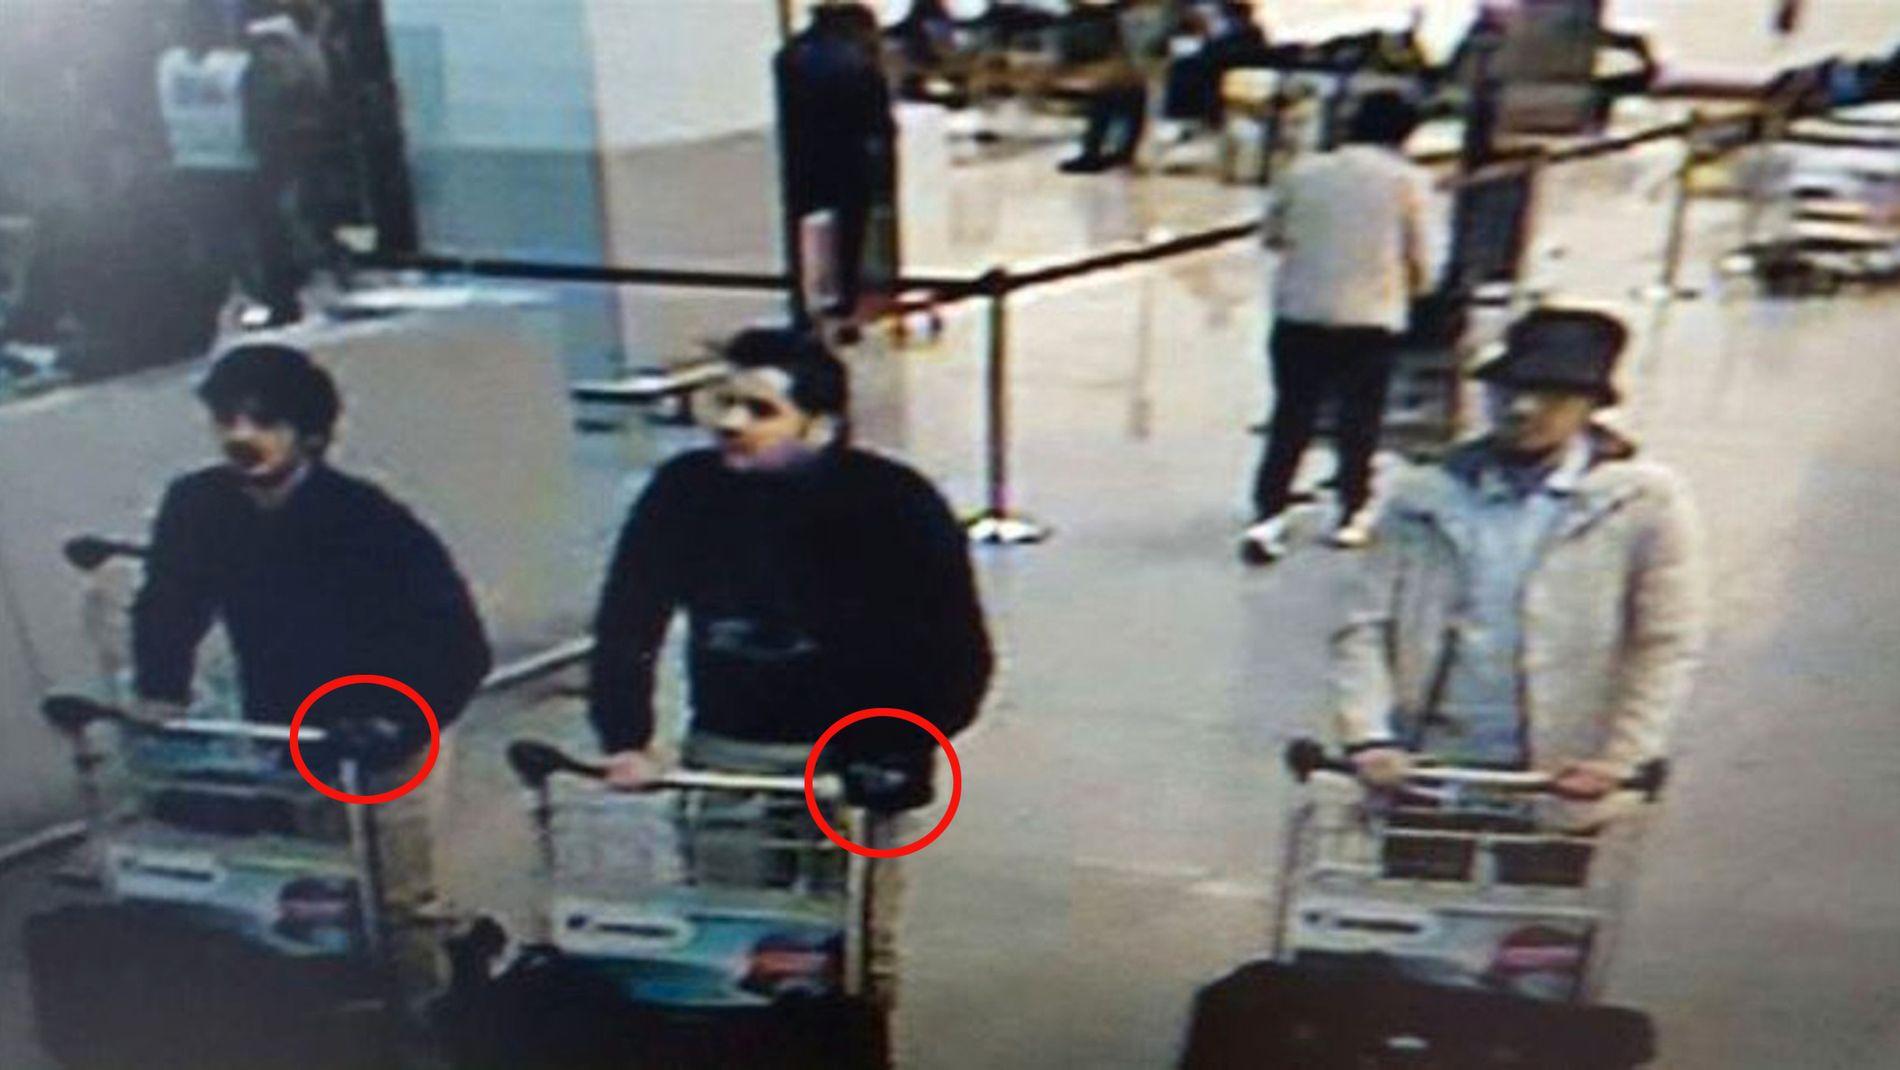 MISTENKT: Ibrahim El Kabraoui er mannen i midten på bildet.